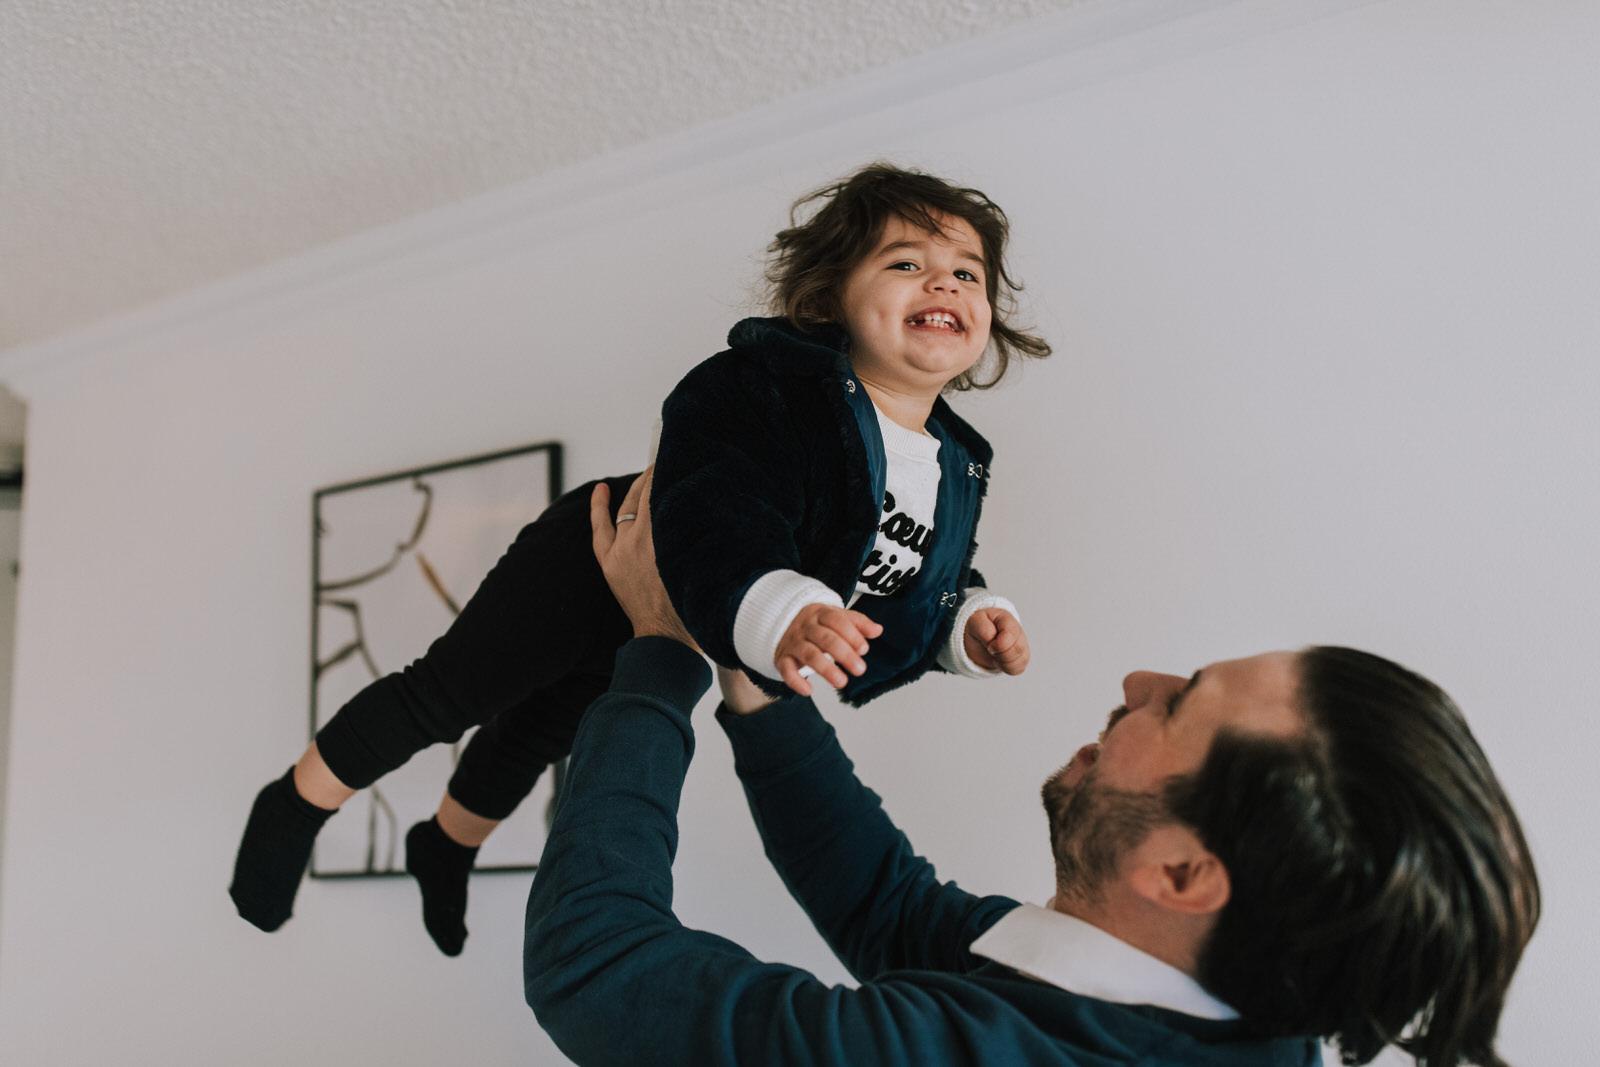 family-session-the-jupps-vancouver-photographer-iamjohnyoo-03.JPG